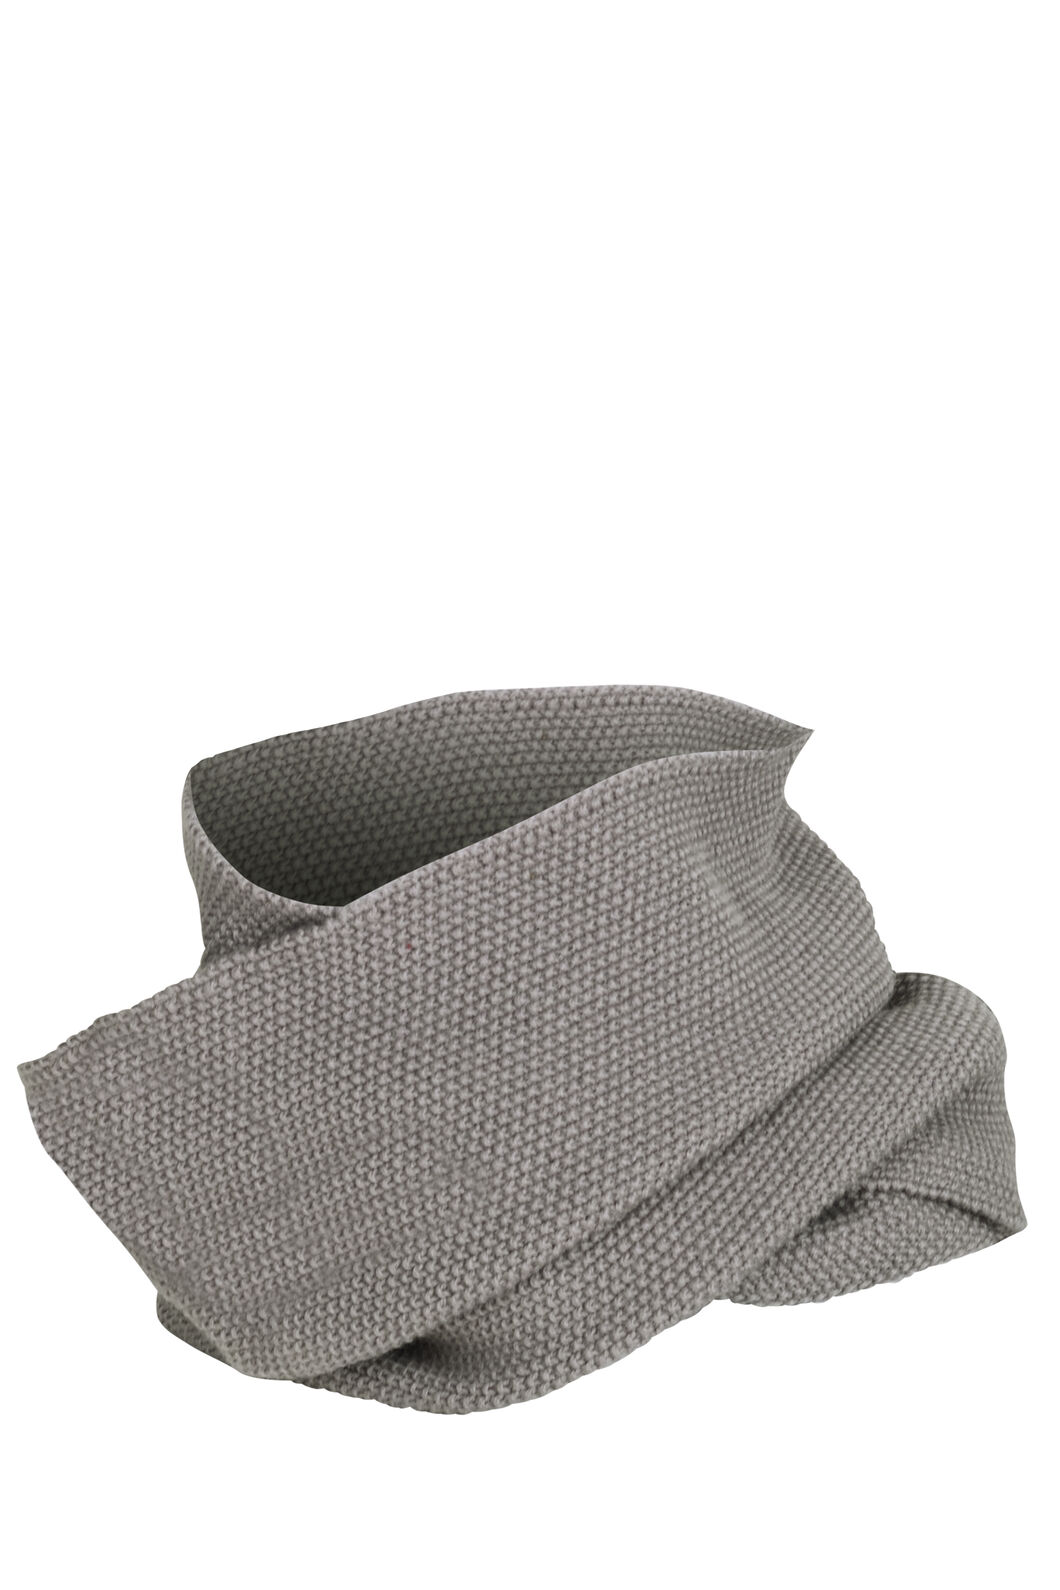 Macpac Pearl Knit Infinity Scarf, Timberwolf, hi-res